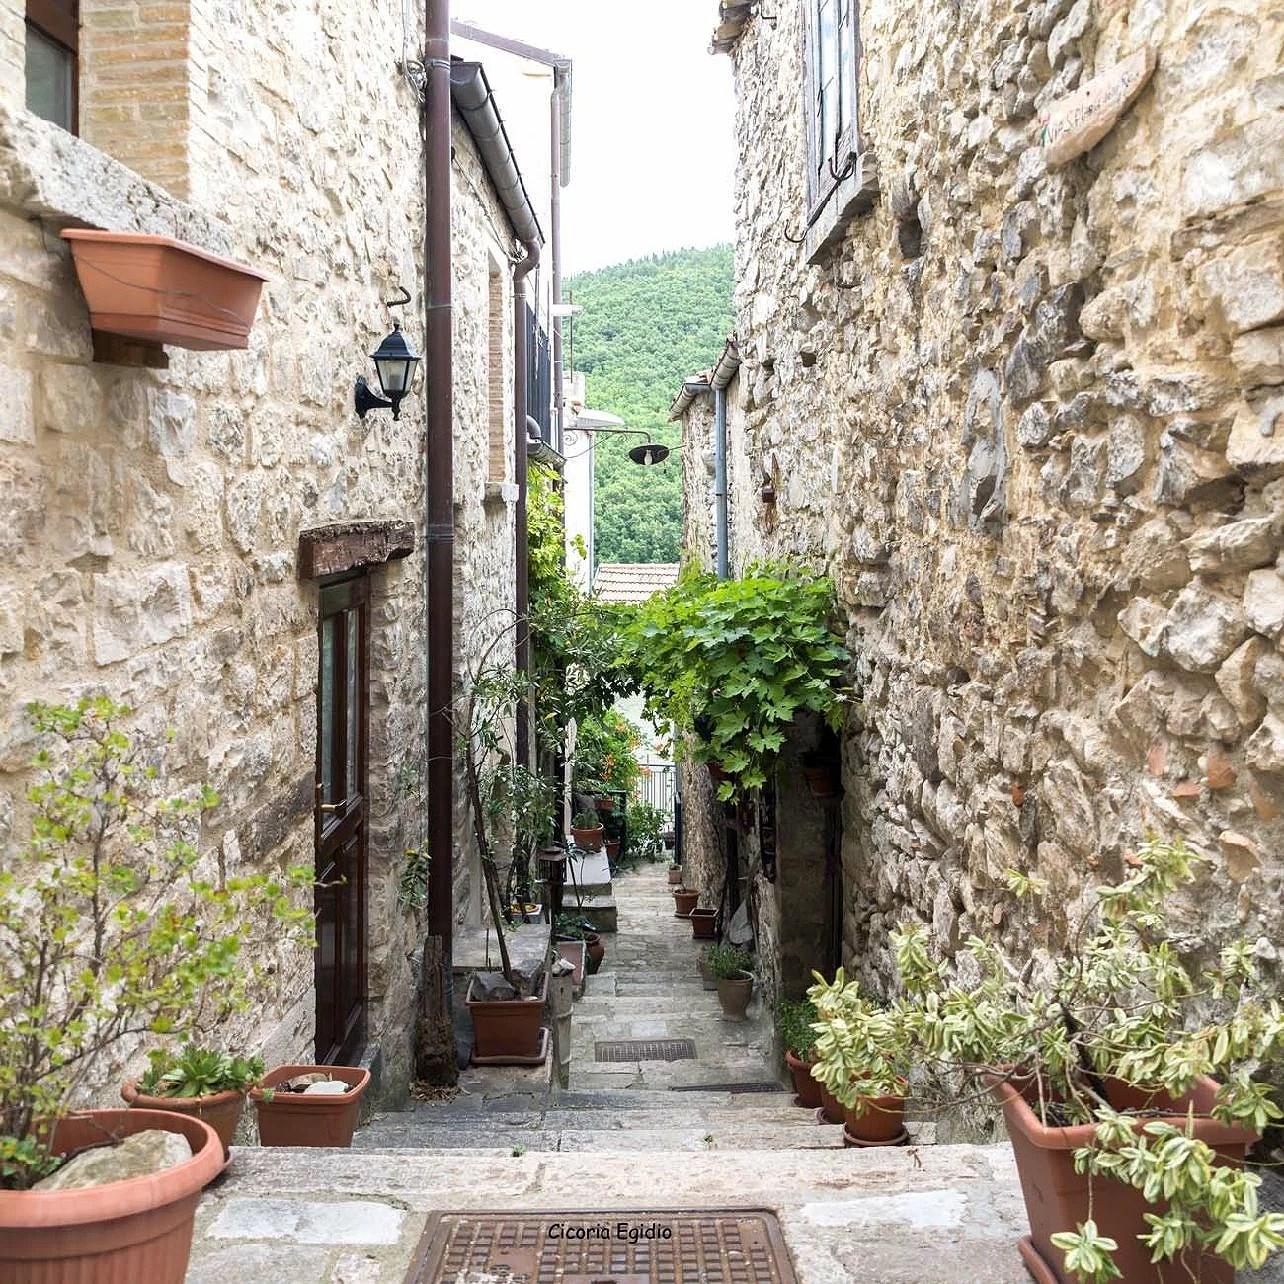 Bonefro i regionen Molise i Italien